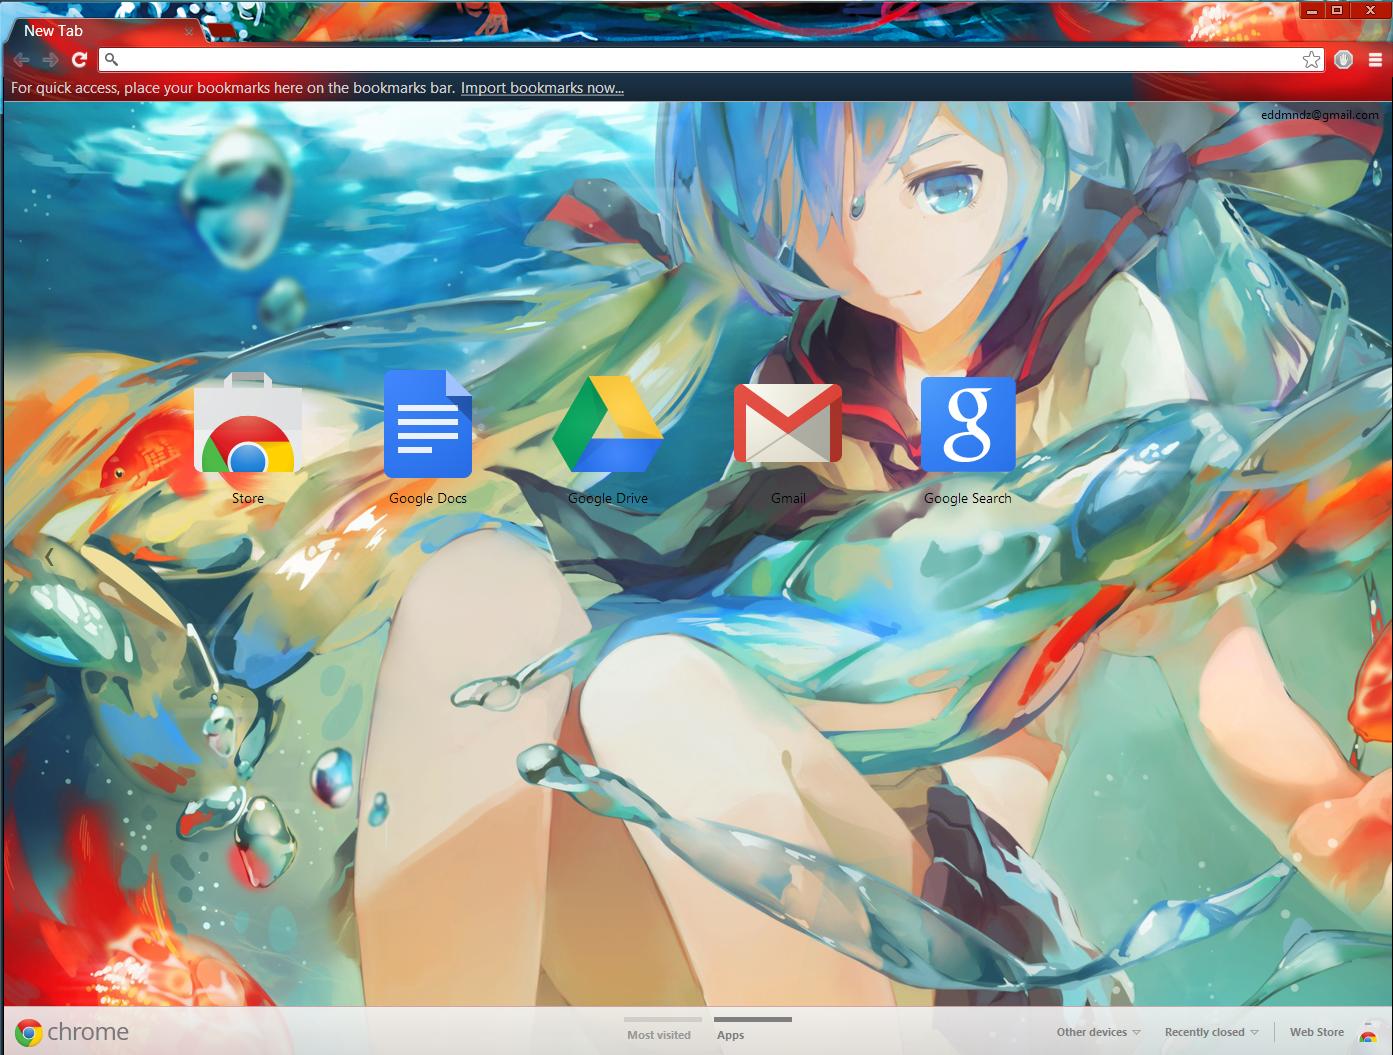 Google themes hatsune miku - Pigletiger 208 92 Hatsune Miku Goldfish By Mangaserver